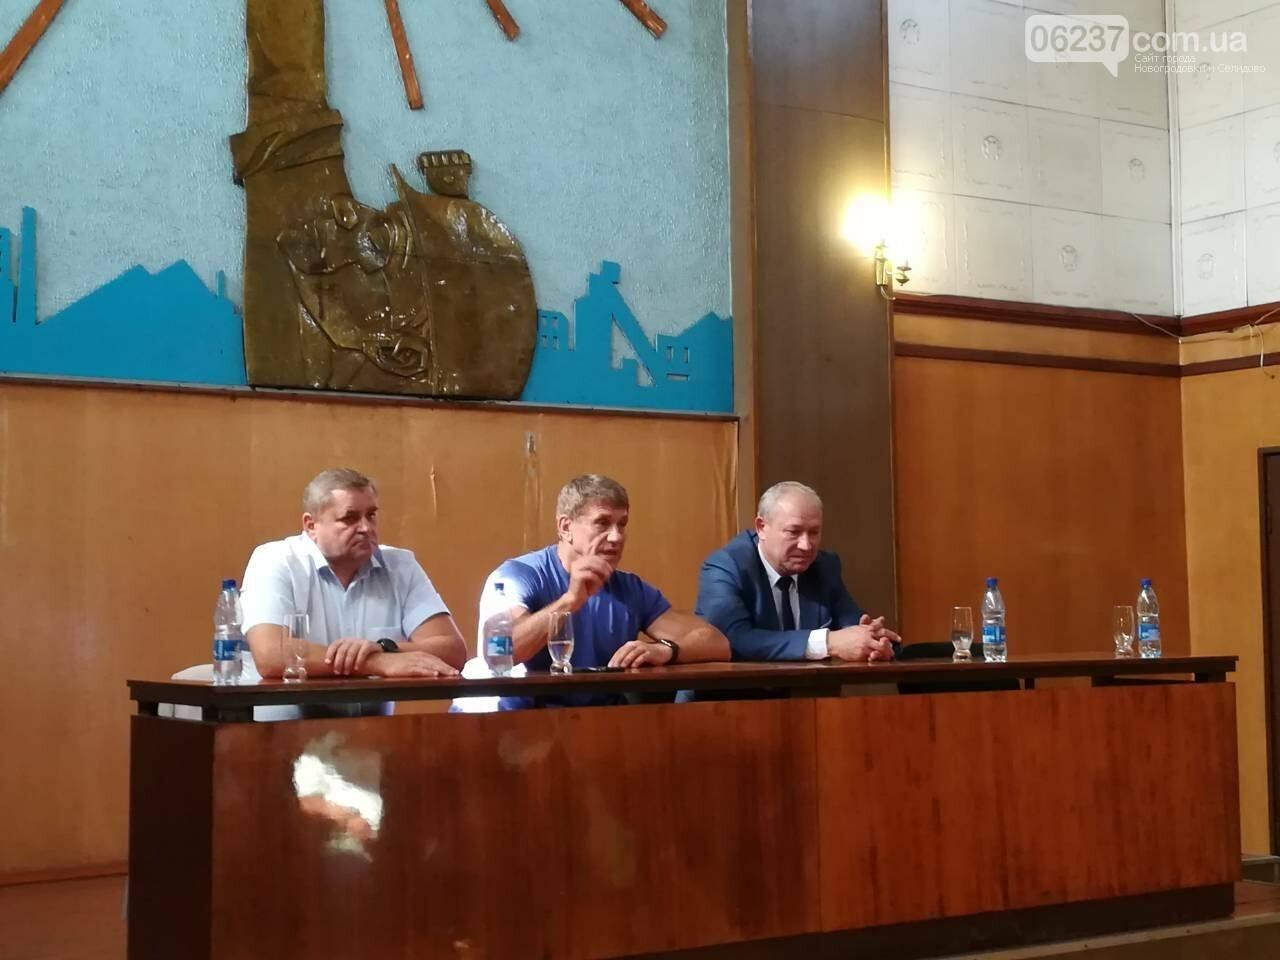 Сергей Сажко: «Ни одна шахта на моем округе не будет закрыта», фото-2